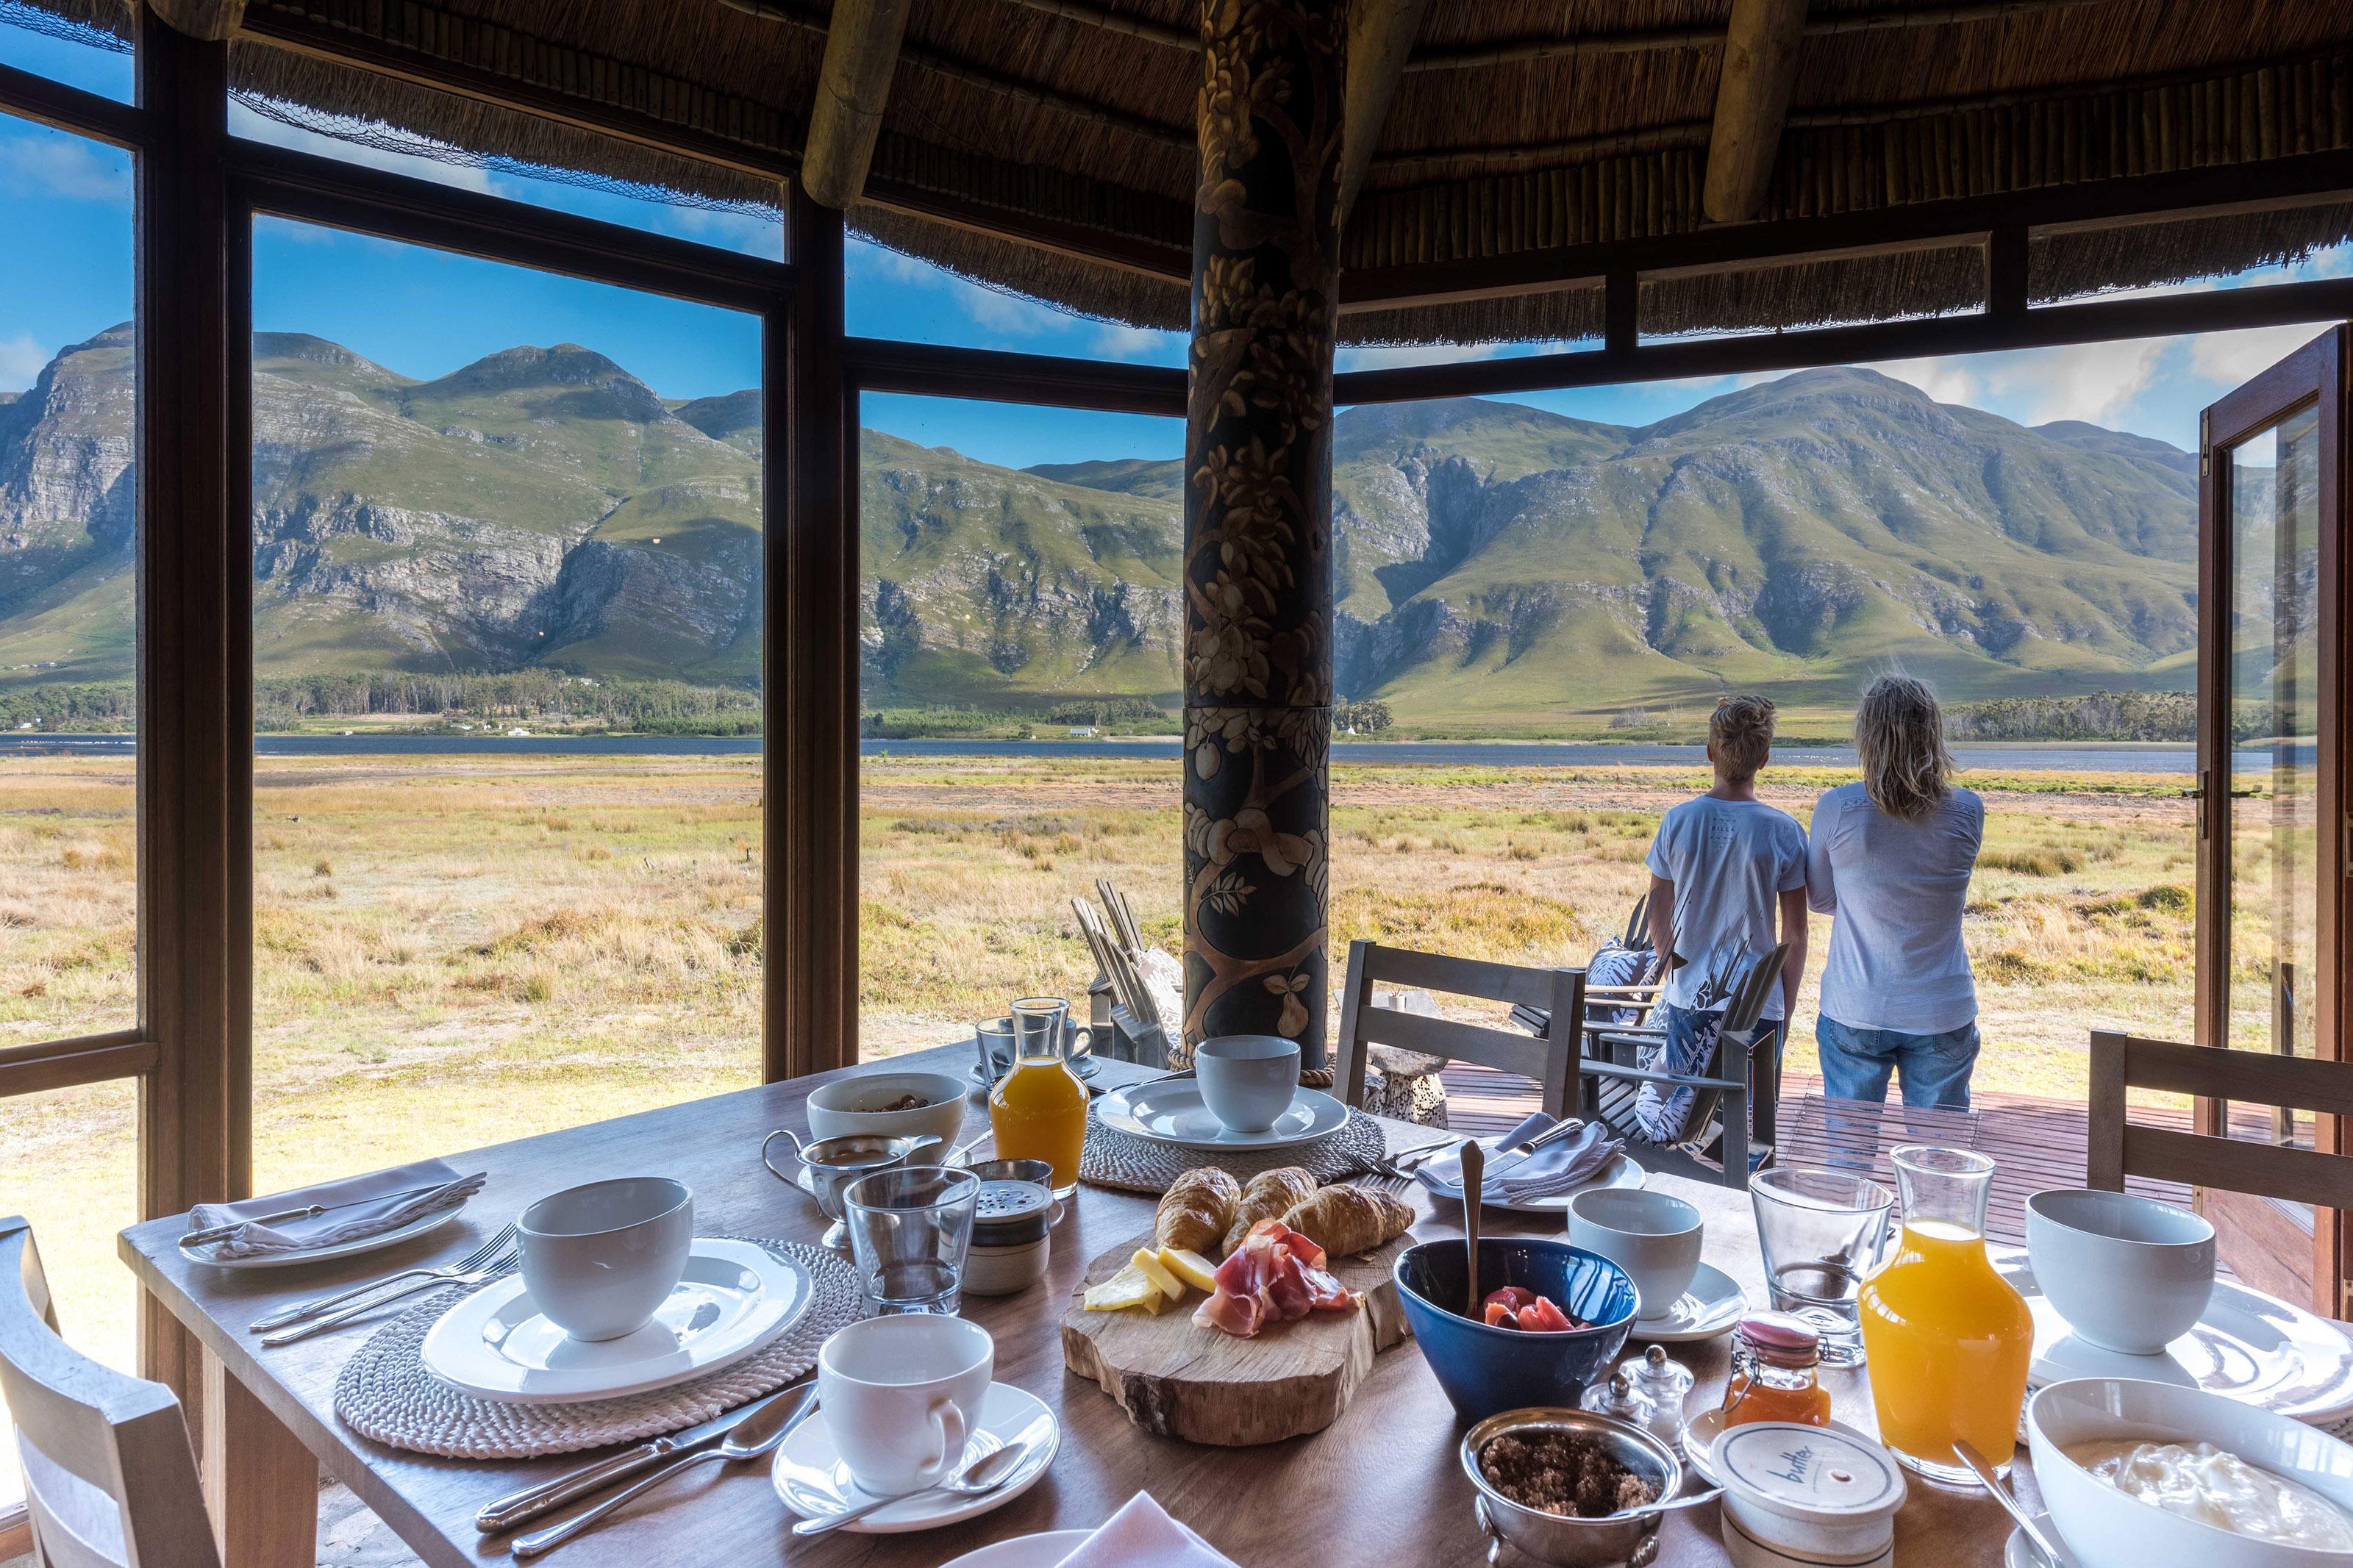 Enjoy fresh cuisine with spectacular mountain views